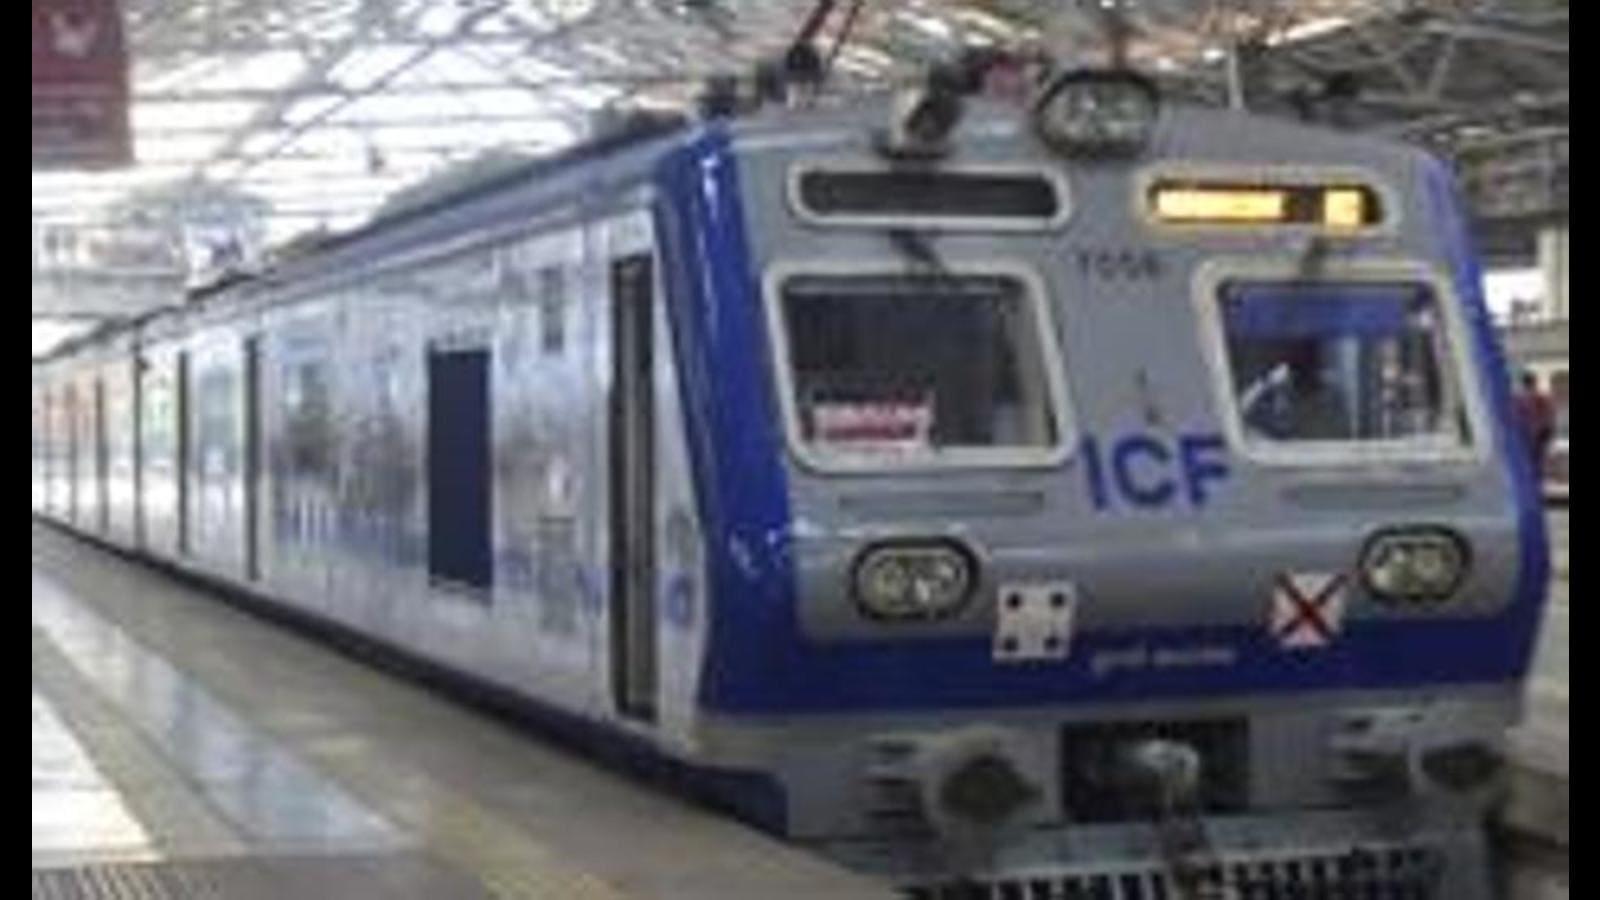 Railways to convert local trains on Mumbai suburban network to AC trains